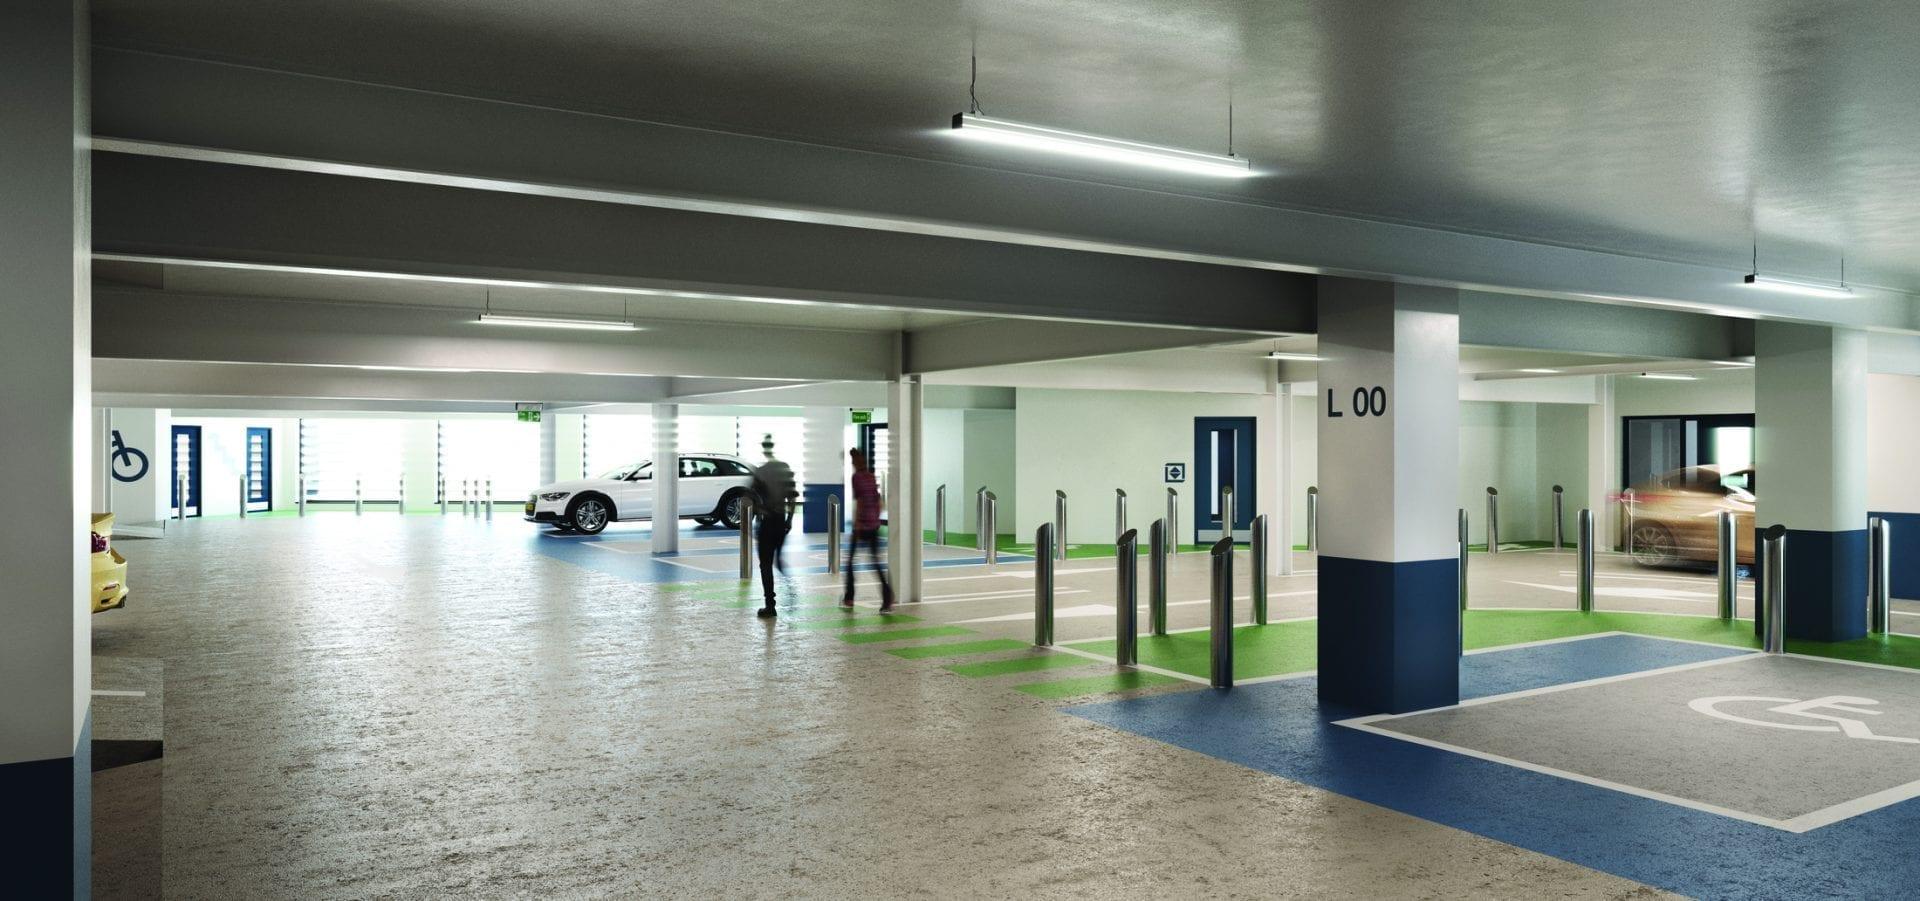 Car-Park-Image